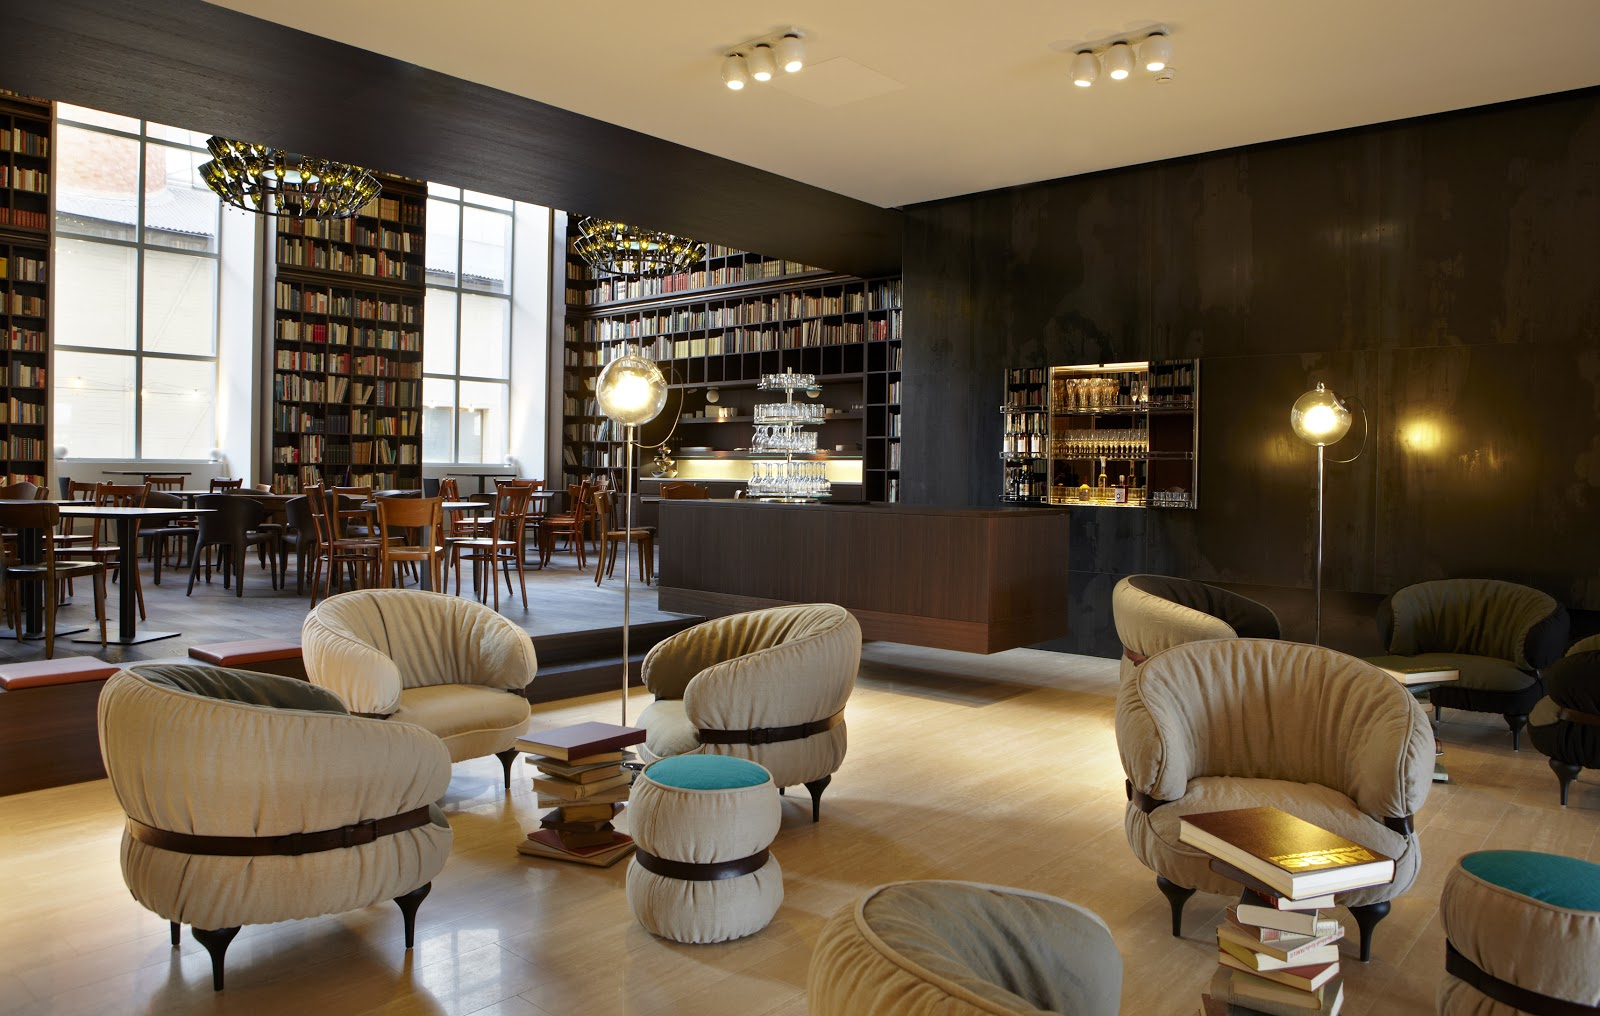 Library Lounge B2 Boutique Hotel Zurich Book Patrol